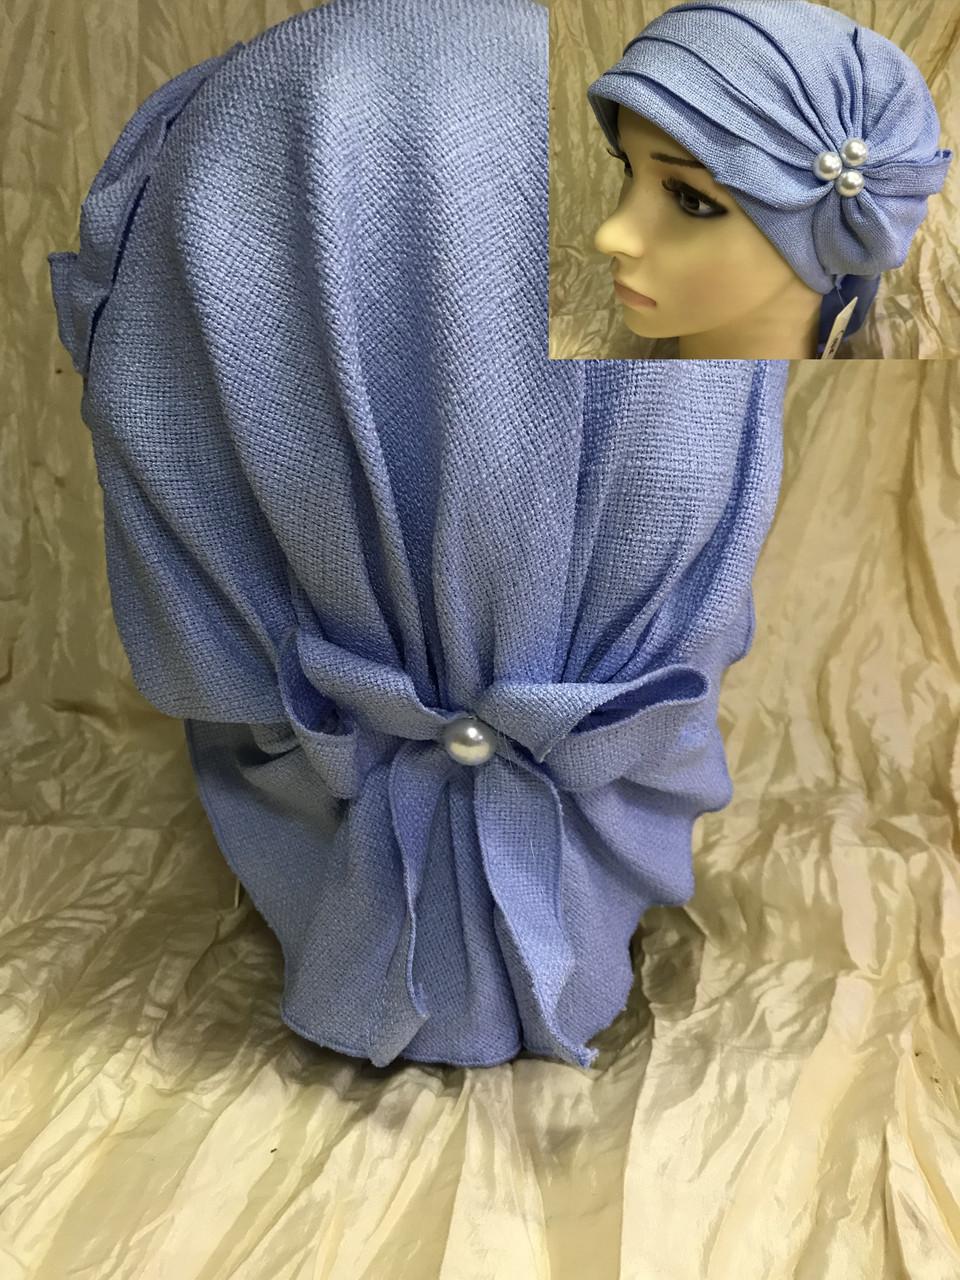 Летняя бандана-шапка-косынка-чалма голубая с хвостом сзади